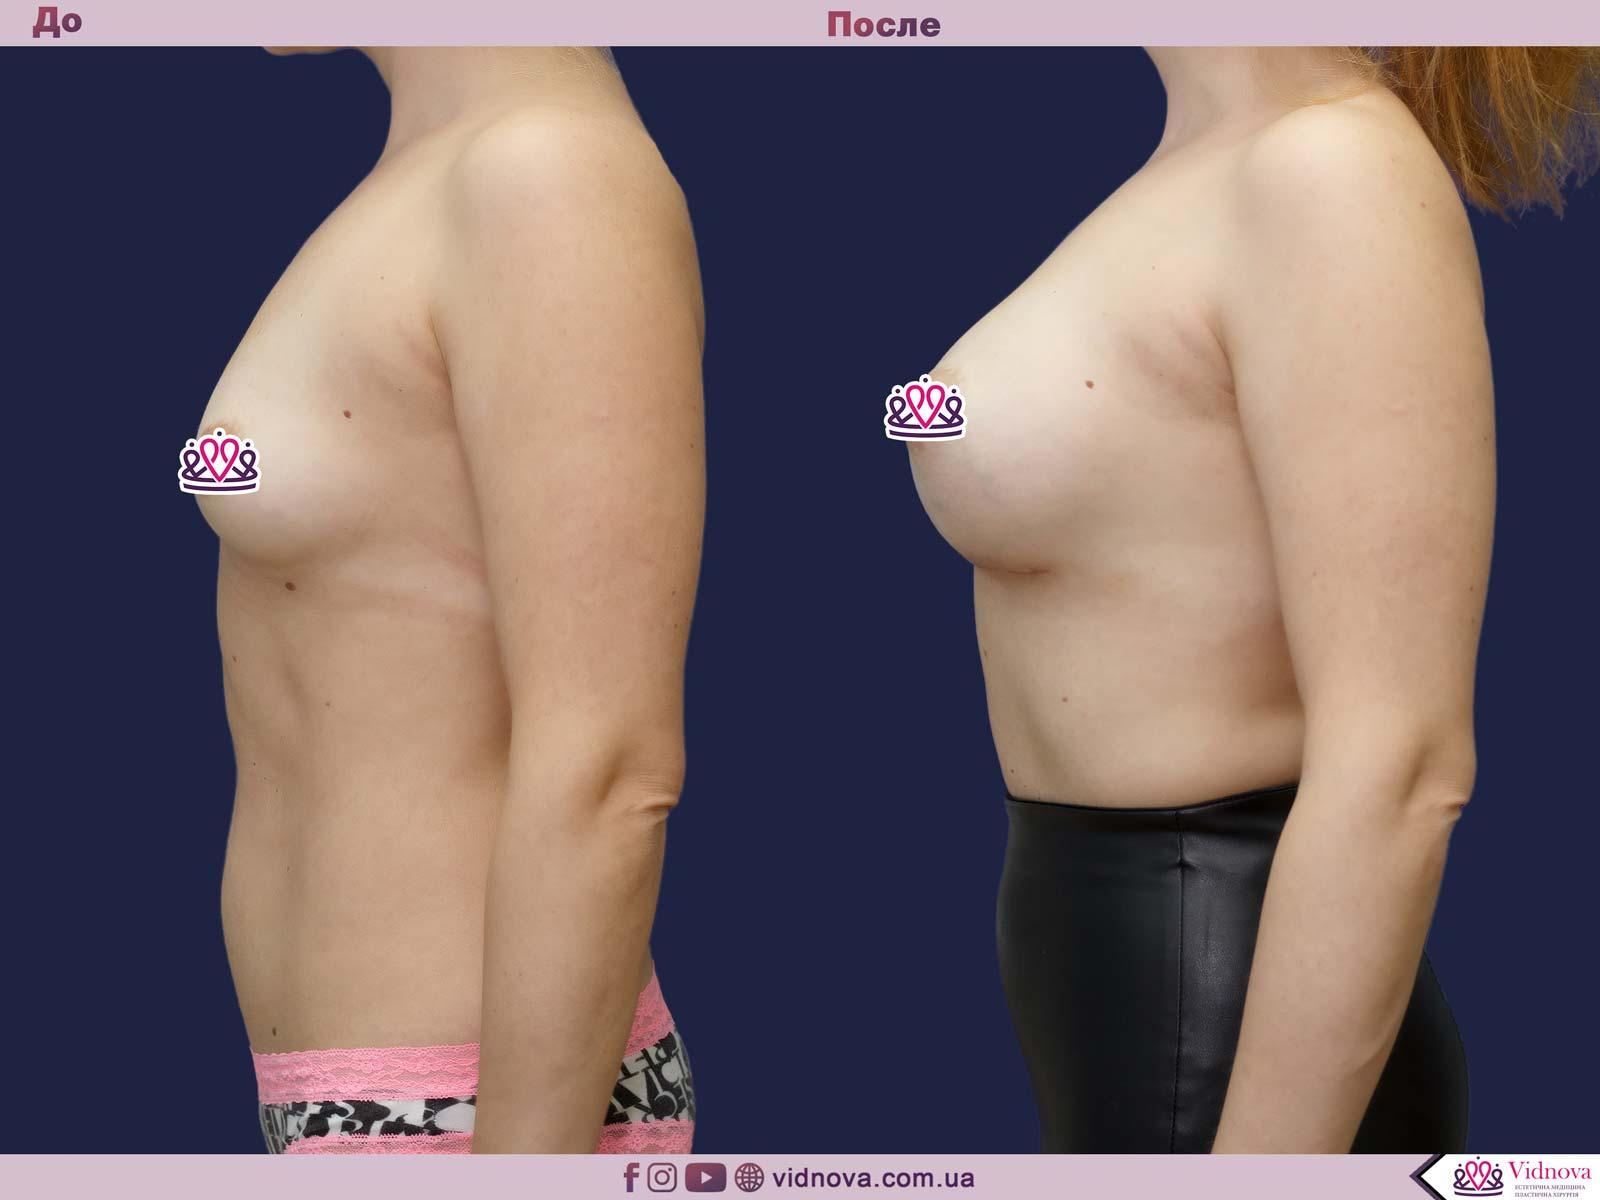 Увеличение груди: Фото ДО и ПОСЛЕ - Пример №71-3 - Клиника Vidnova